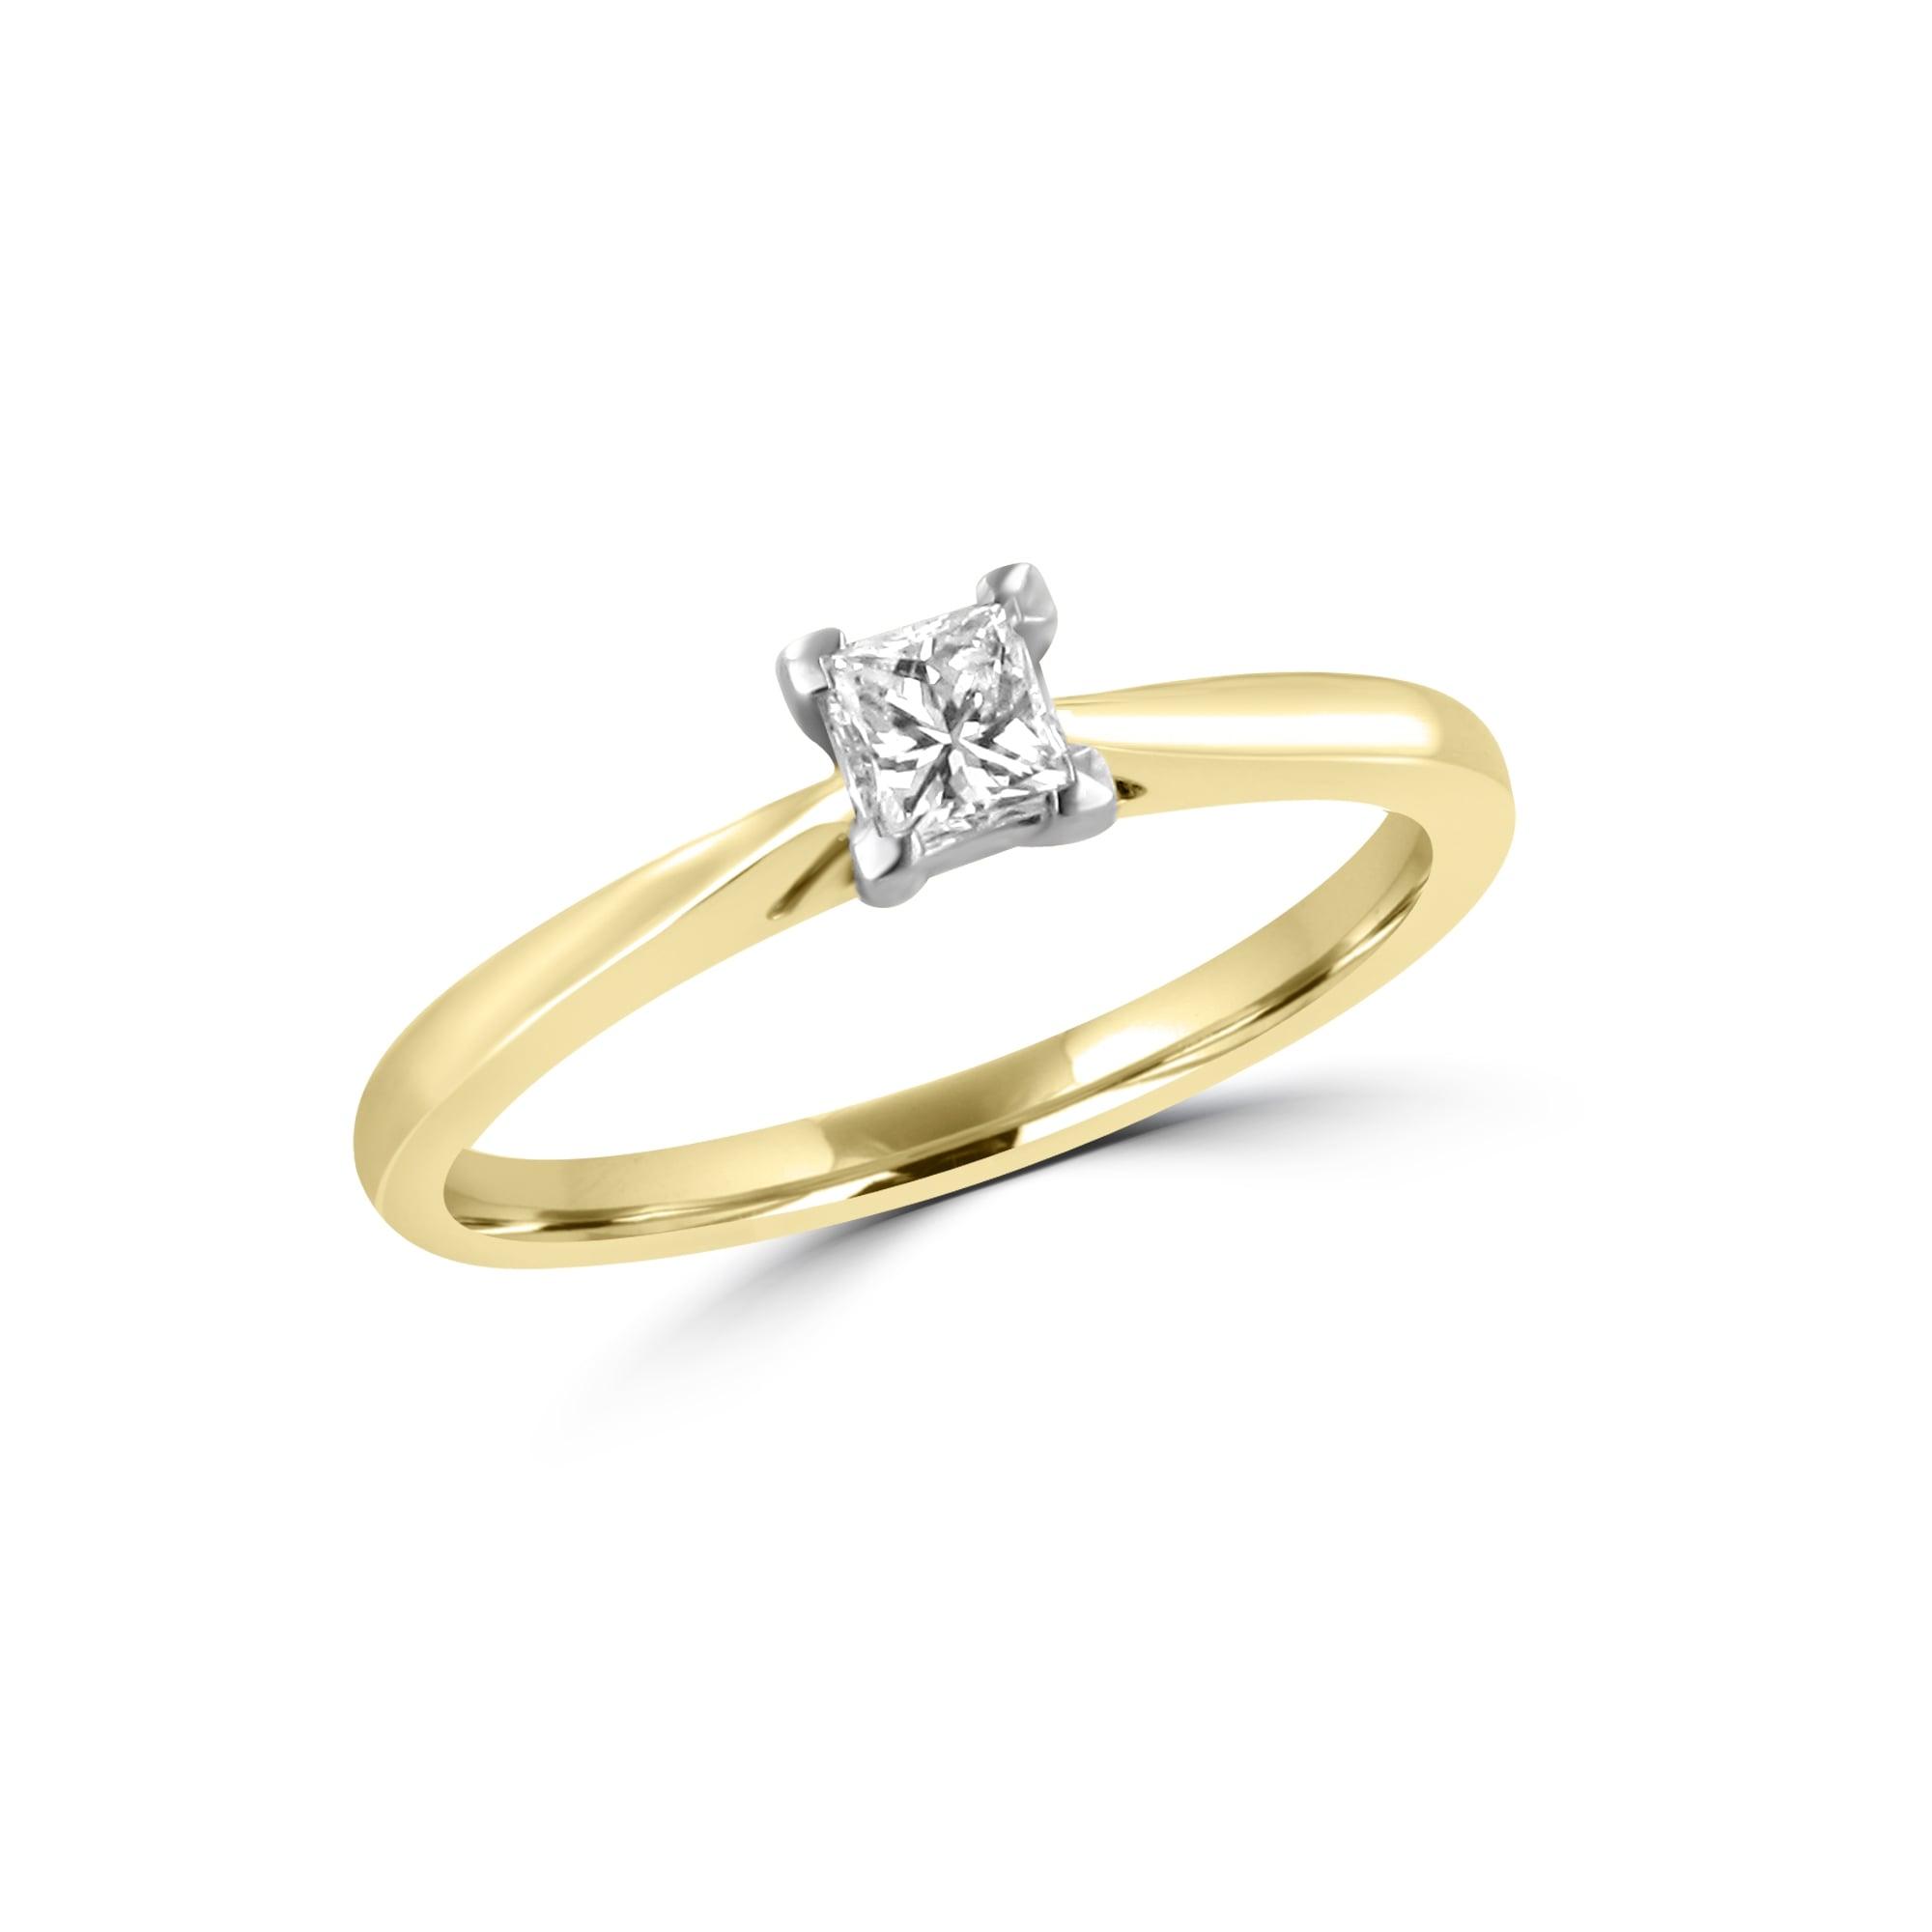 18ct Gold Princess Cut Diamond Ring Avanti Jewellers Ashbourne